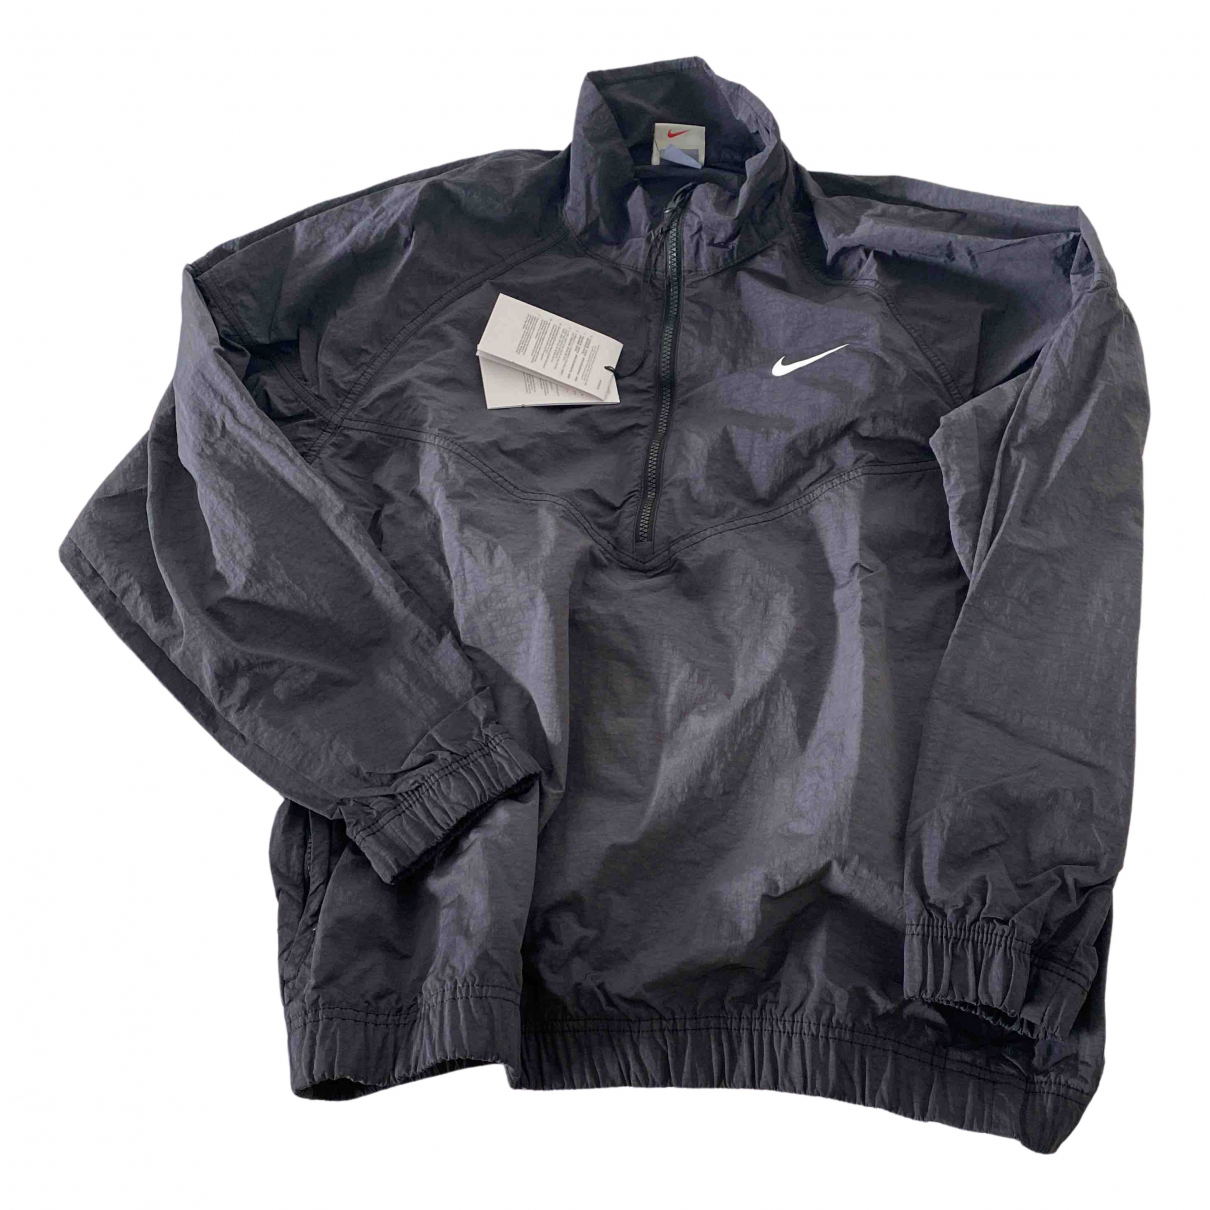 Nike X Stussy \N Black Knitwear & Sweatshirts for Men M International